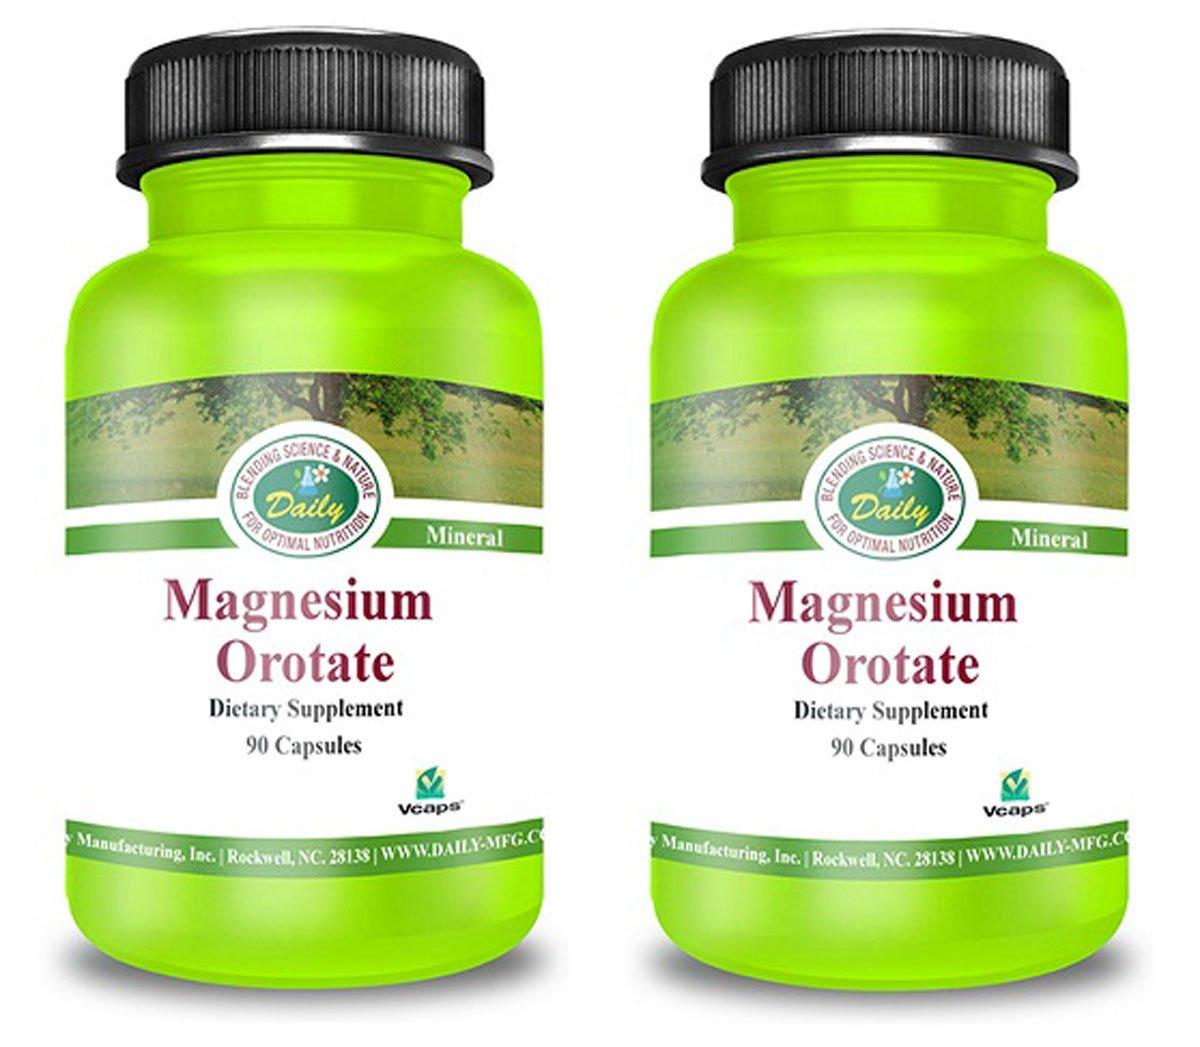 Daily Manufacturing Magnesium Orotate 50 mg 90 Capsules (2)